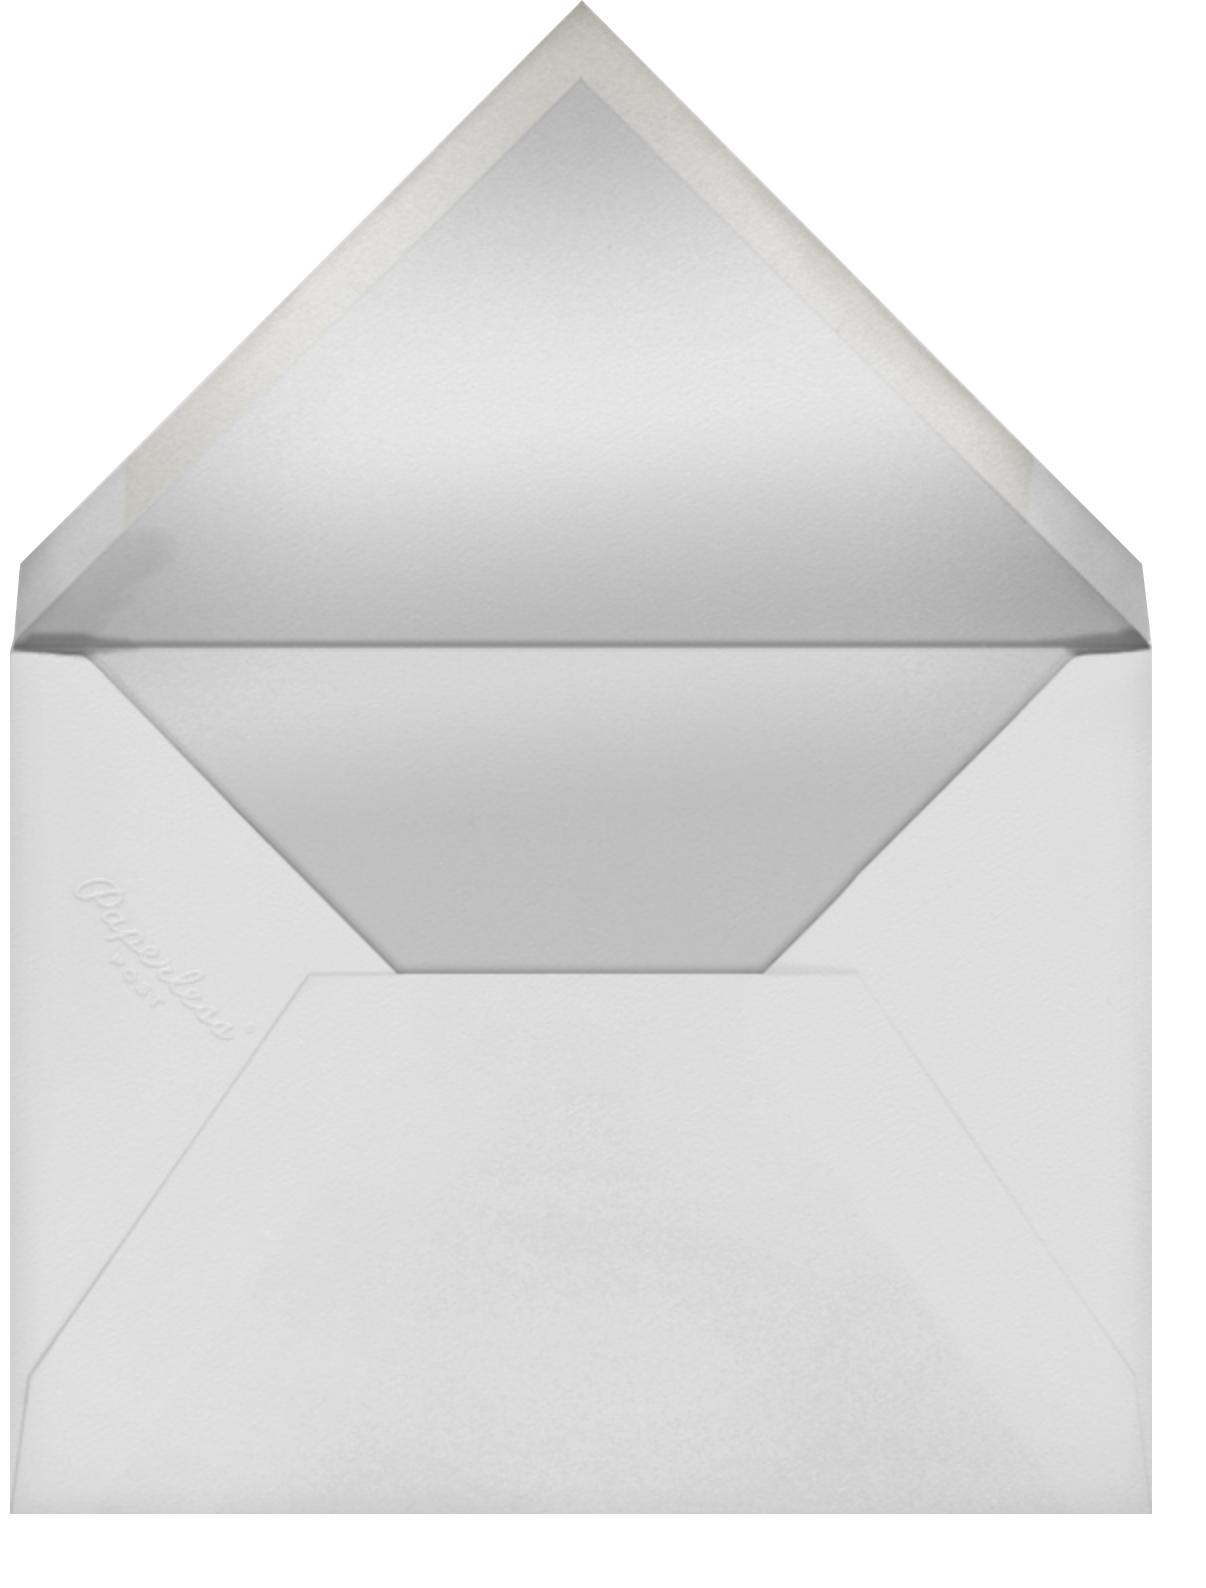 Gradient Border - Green - Paperless Post - Engagement party - envelope back